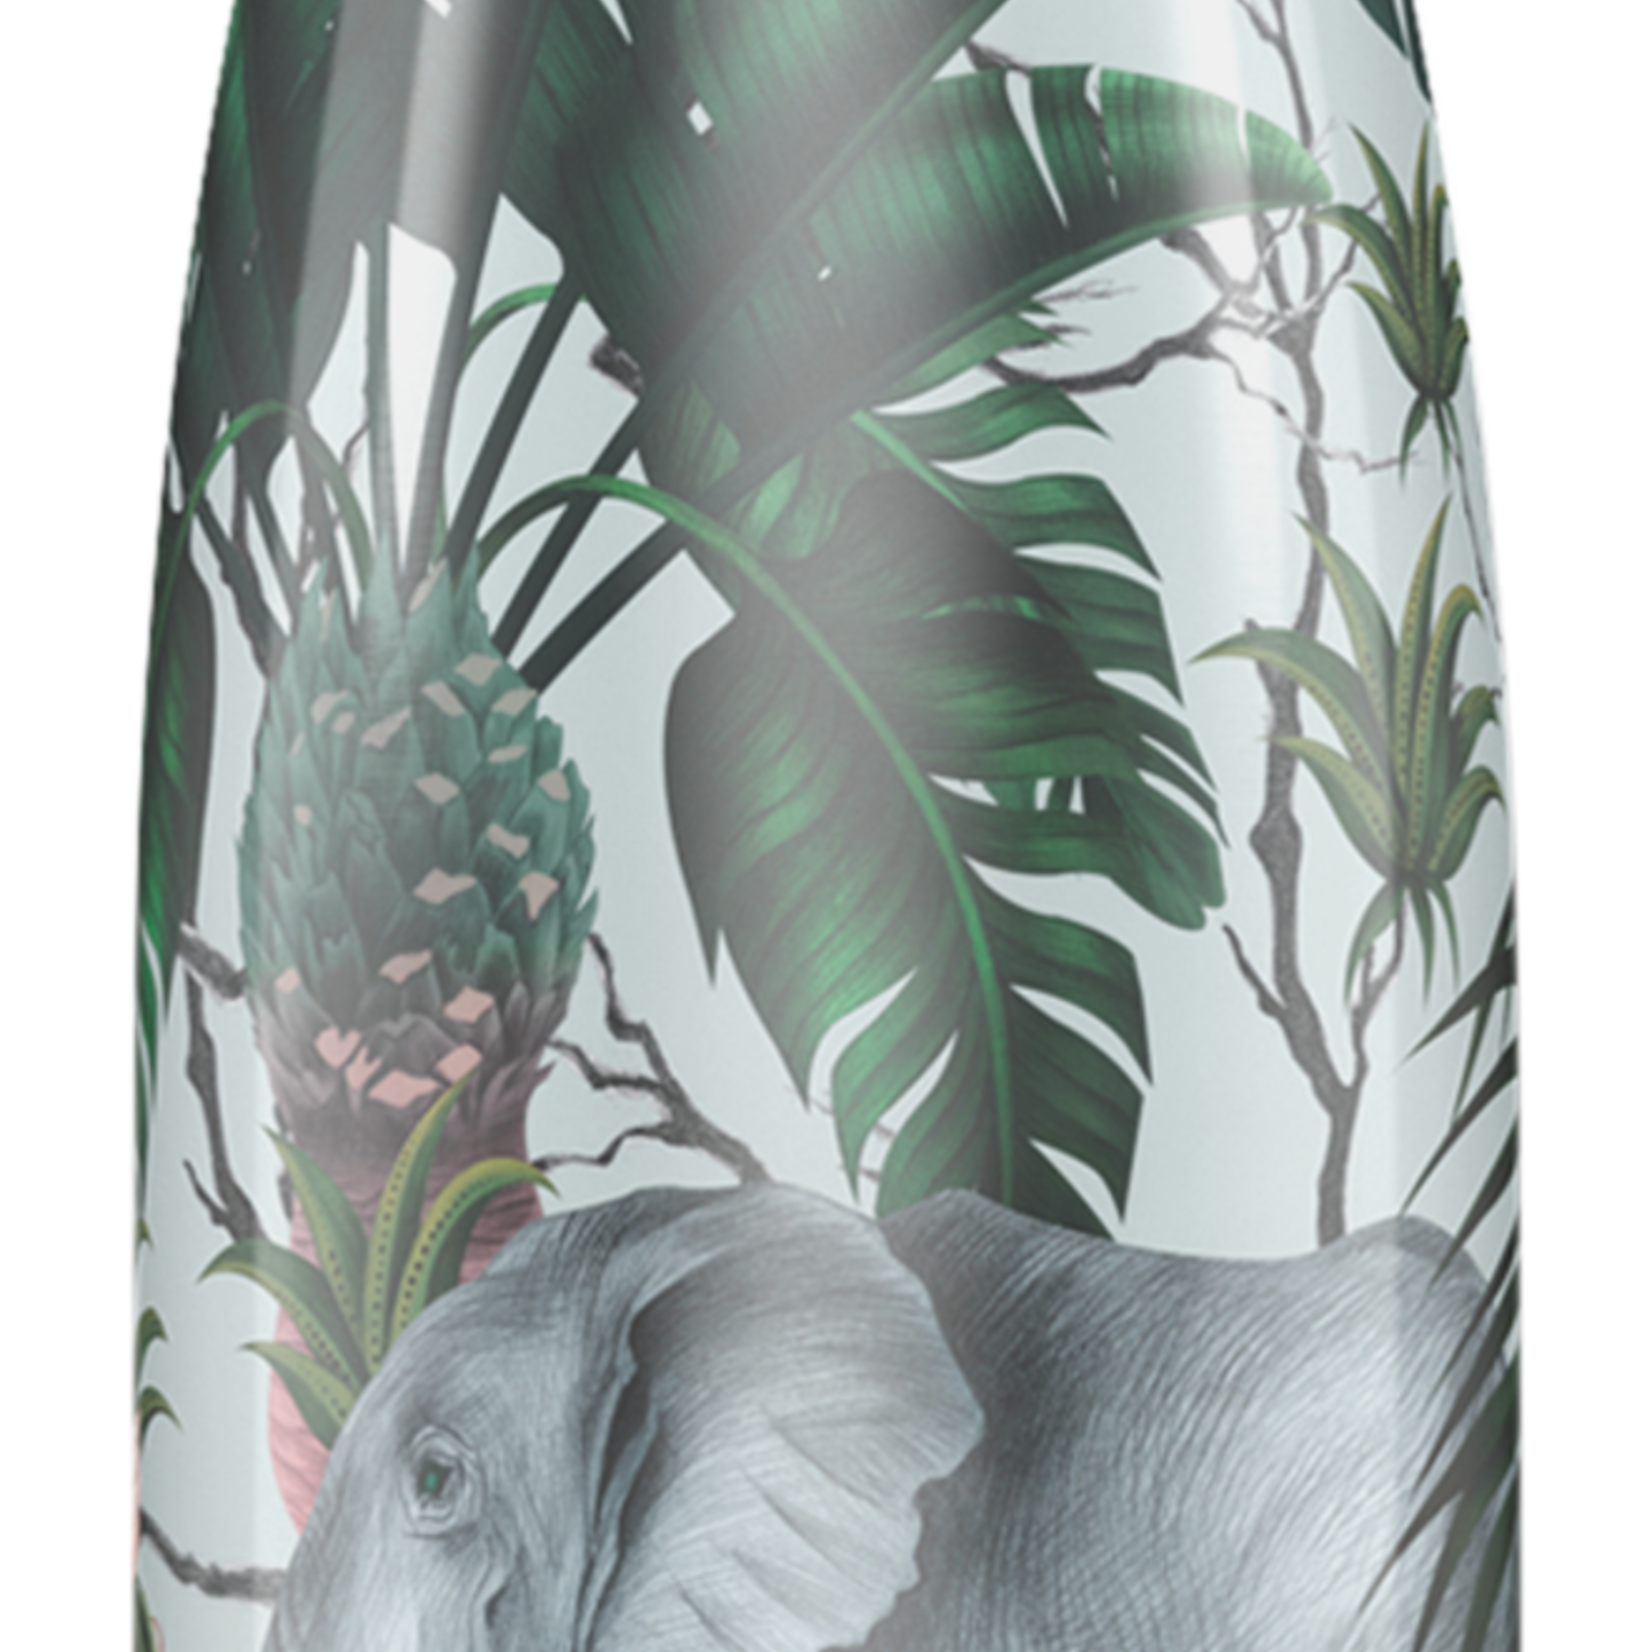 Chilly's Bottle 750ml - Elephant